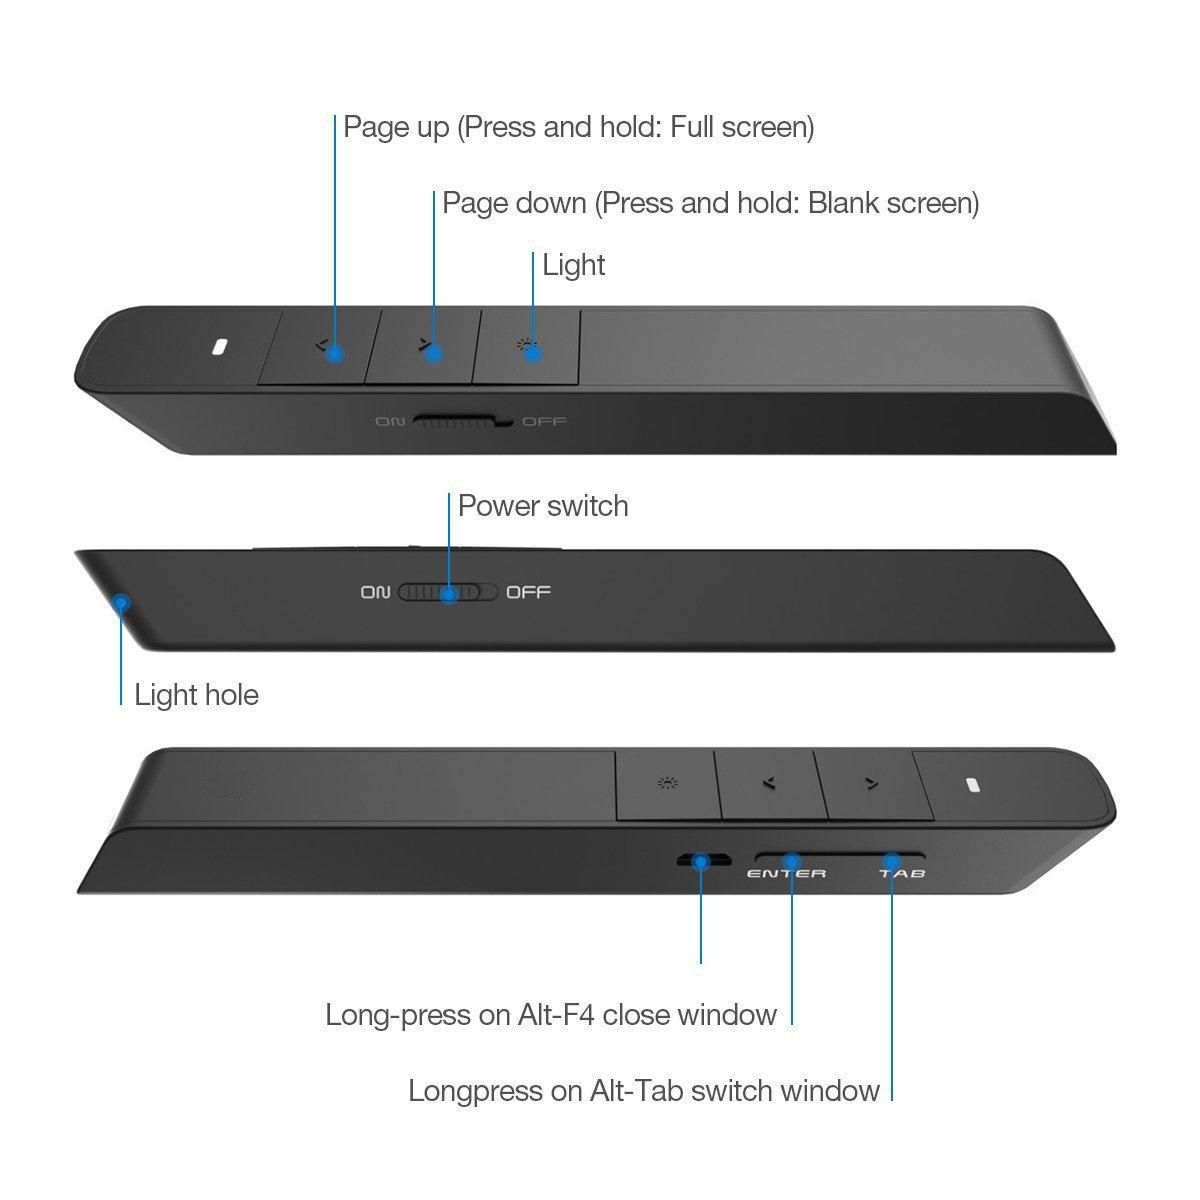 Bluebeach Wireless Wiederaufladbare Usb Presenter Magic Mouse 24ghz Compatible For Laptop Pc Mac Windows 7 10 Black Doff Elektronik